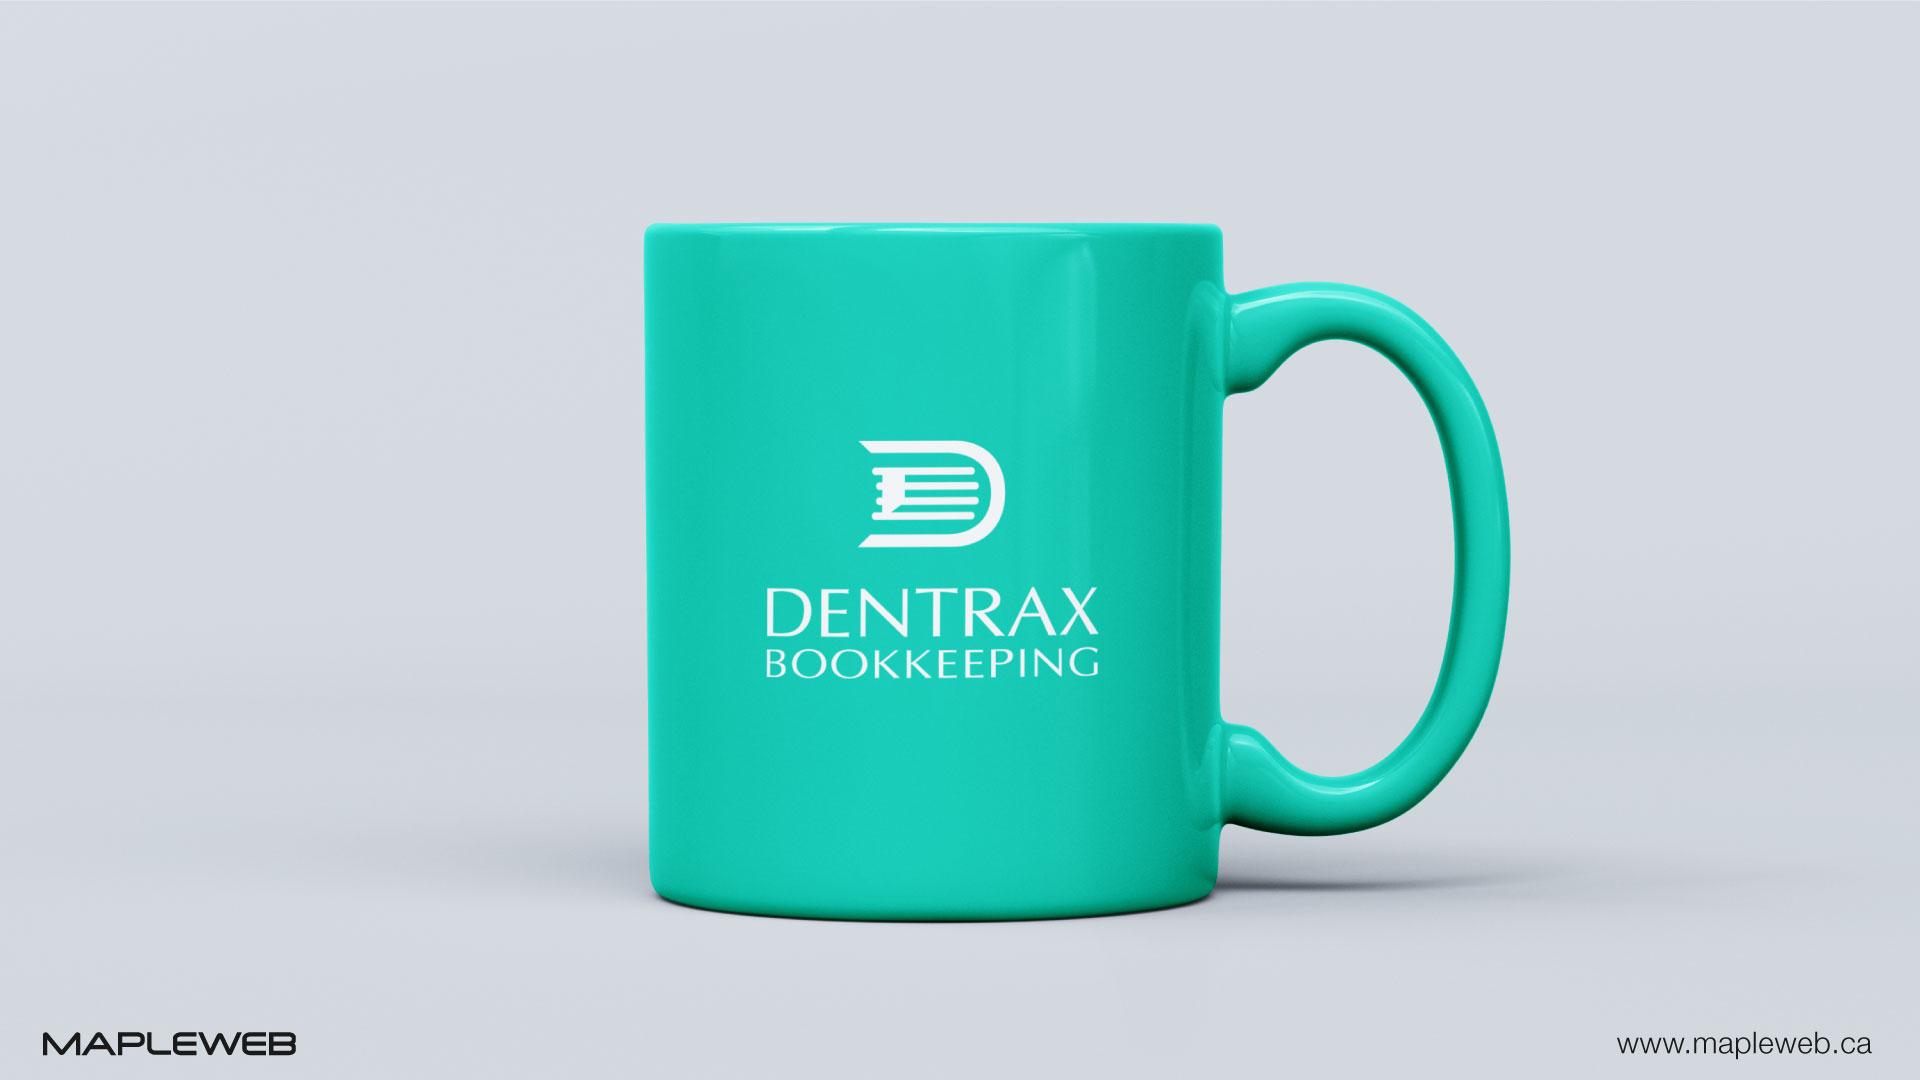 dentraxbookkeeping-brand-logo-design-by-mapleweb-vancouver-canada-mug-mock